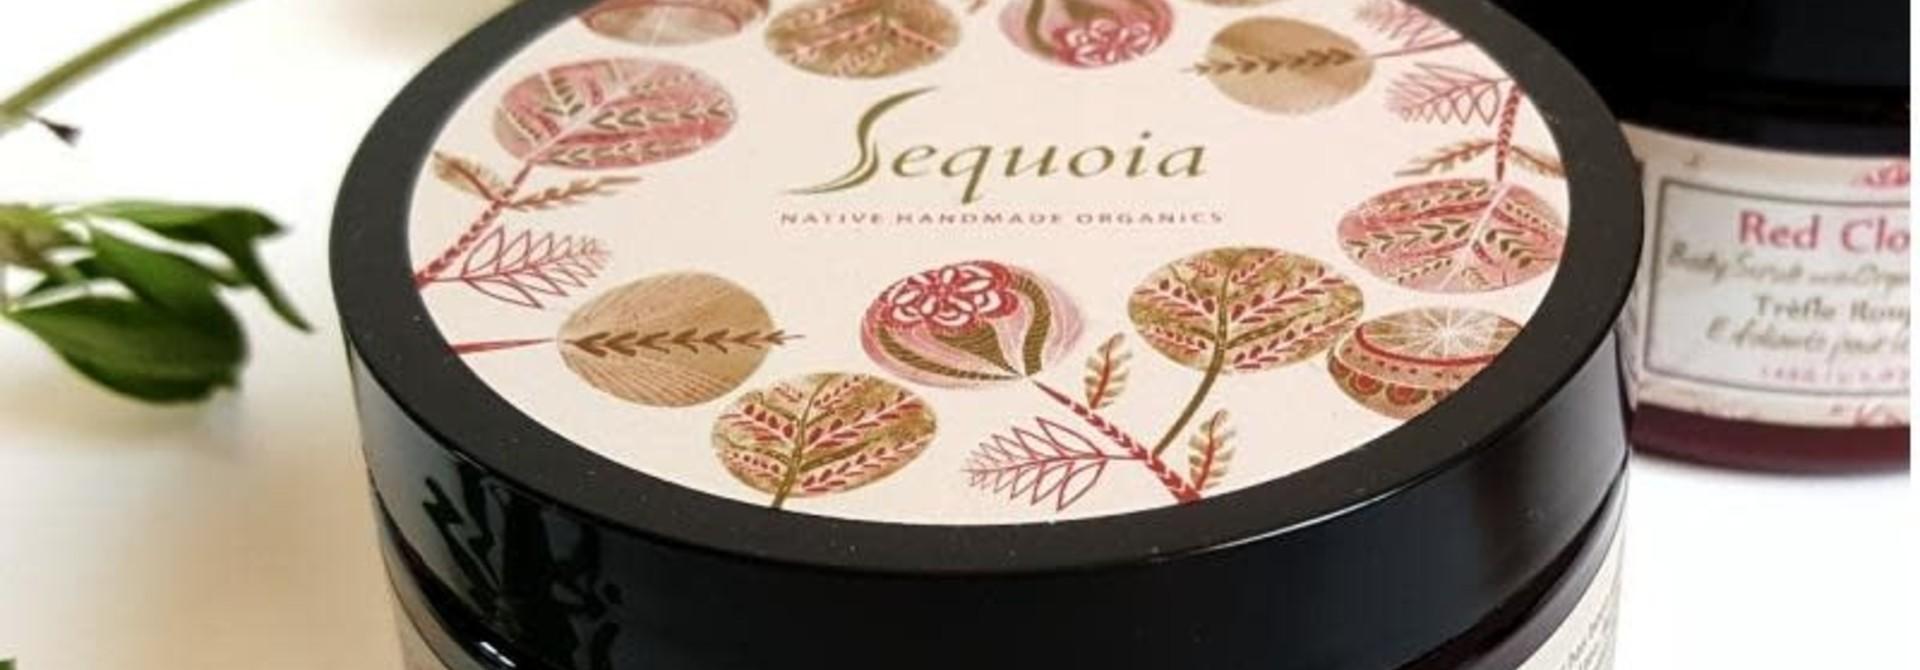 Red Clover Body Scrub 20oz by Sequoia